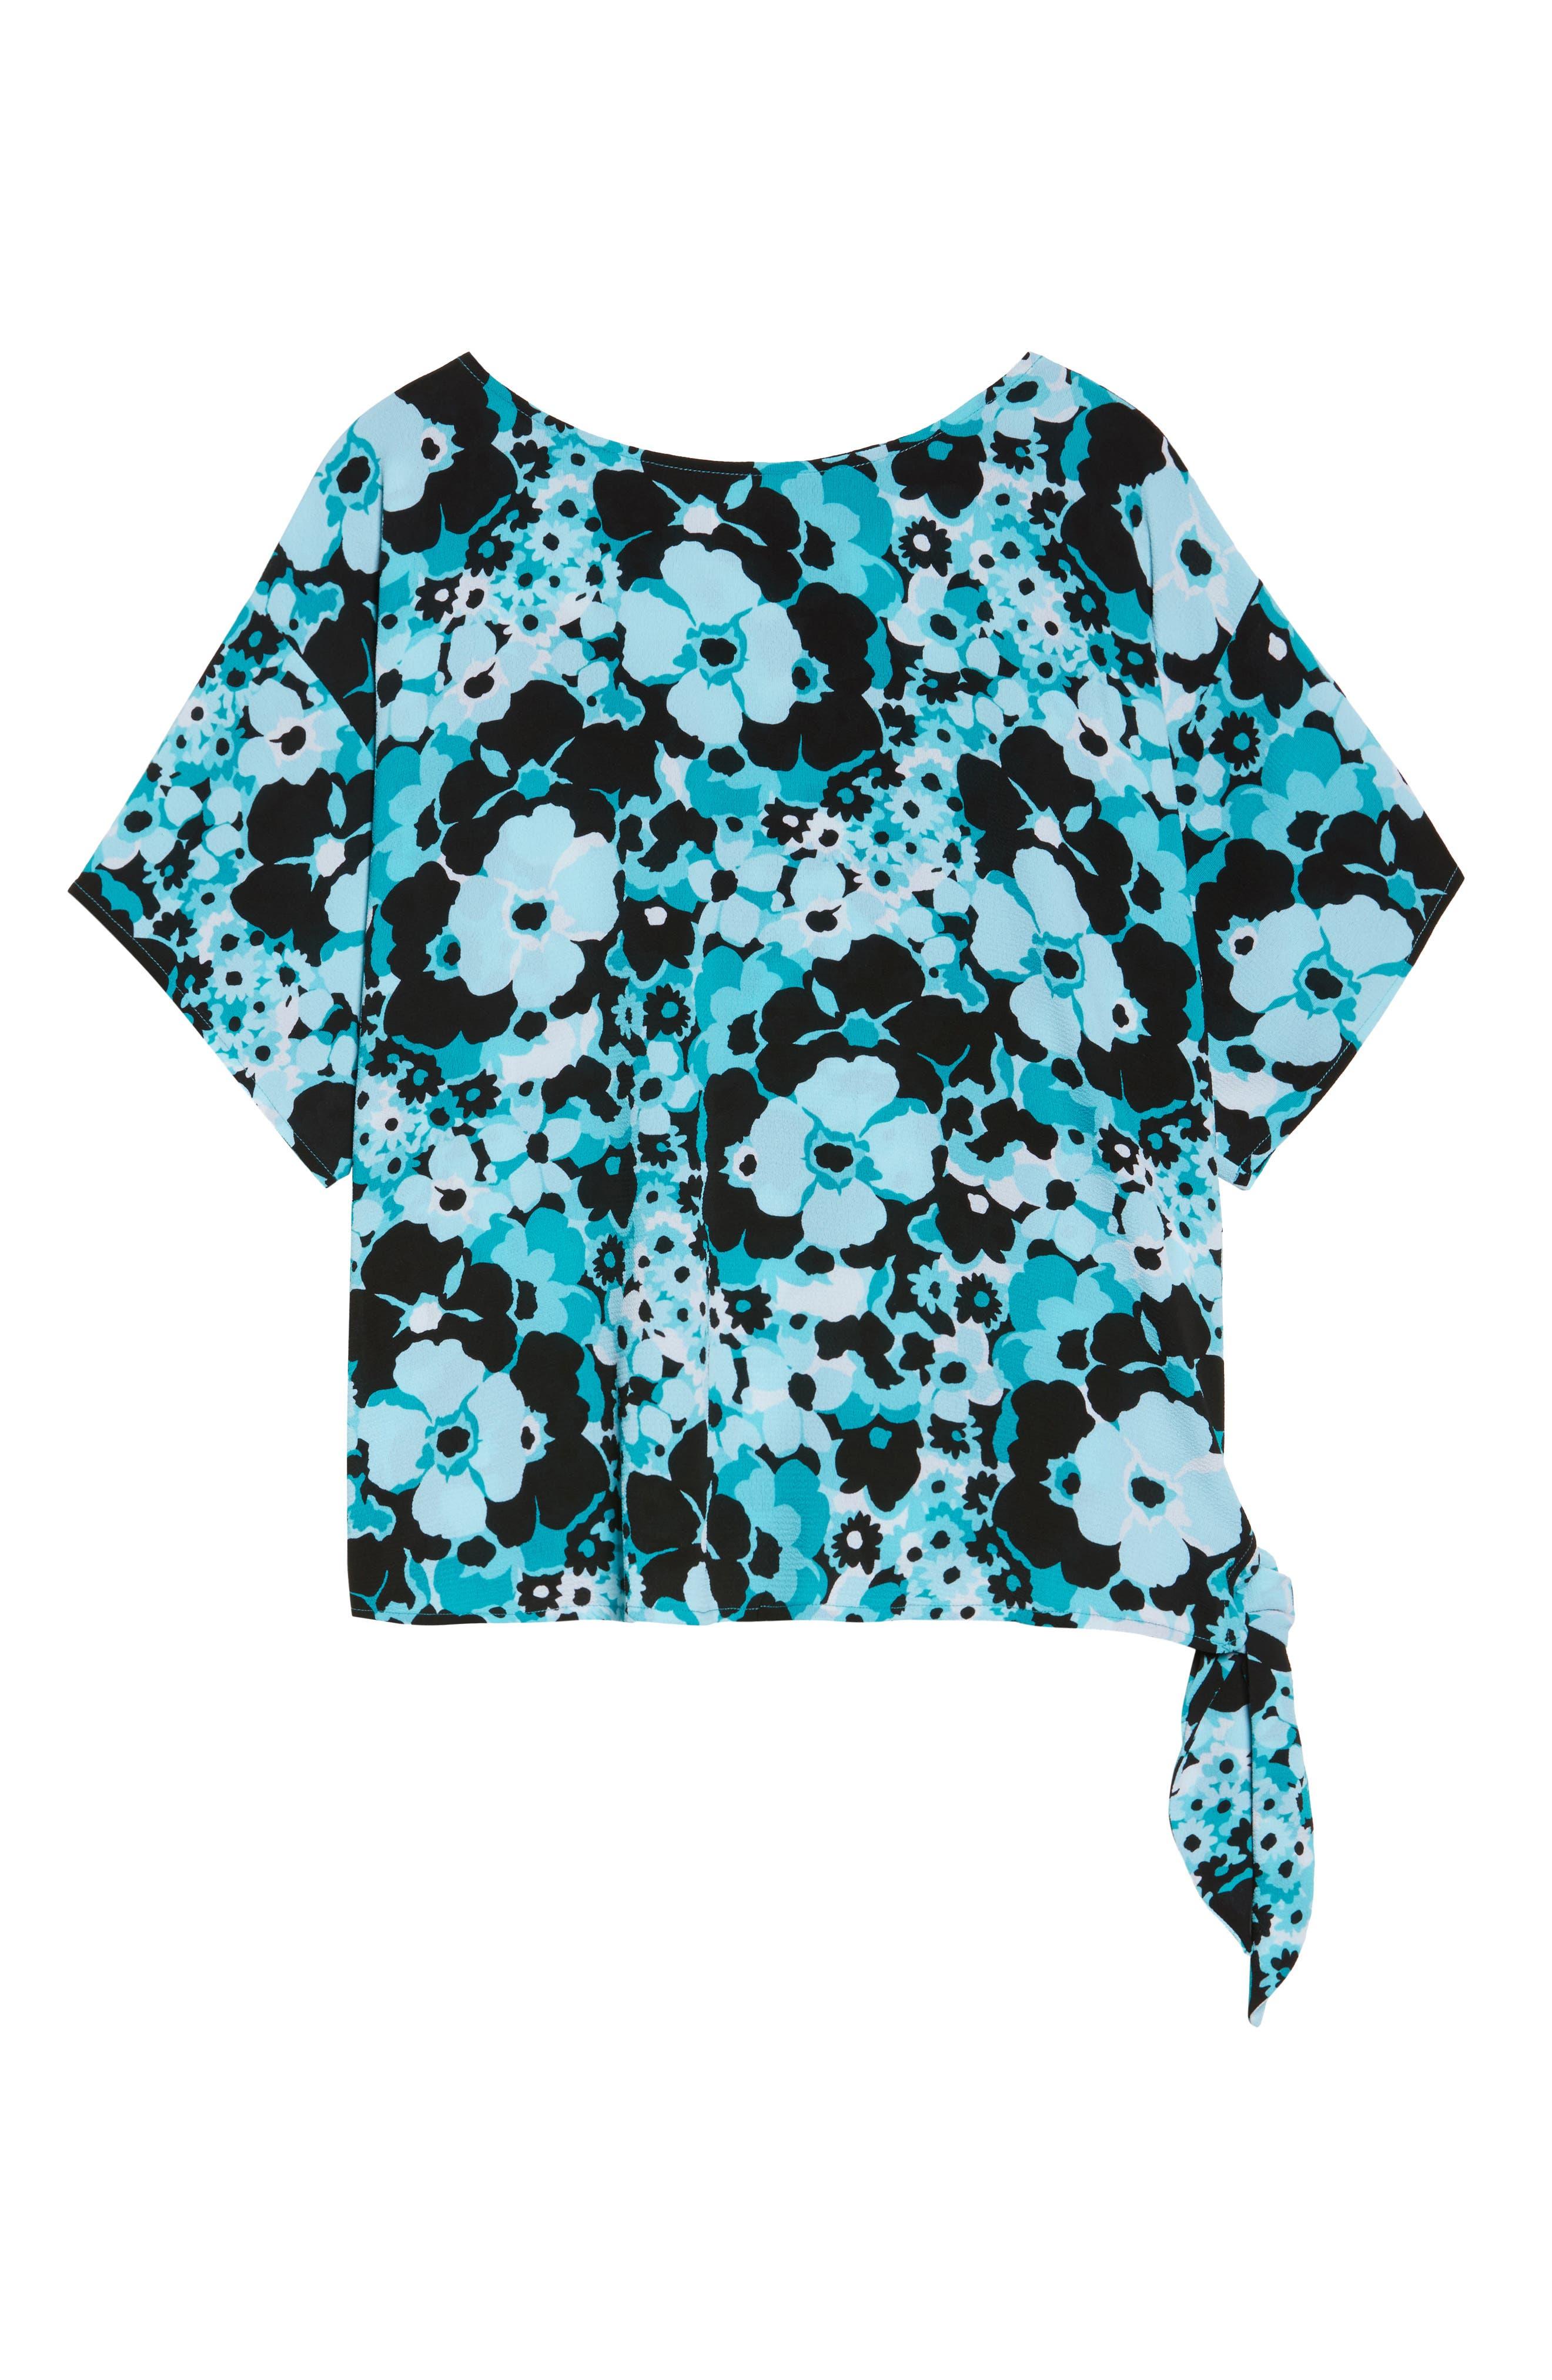 Spring Side Tie Crepe Top,                             Alternate thumbnail 6, color,                             Tile Blue/ Black Multi